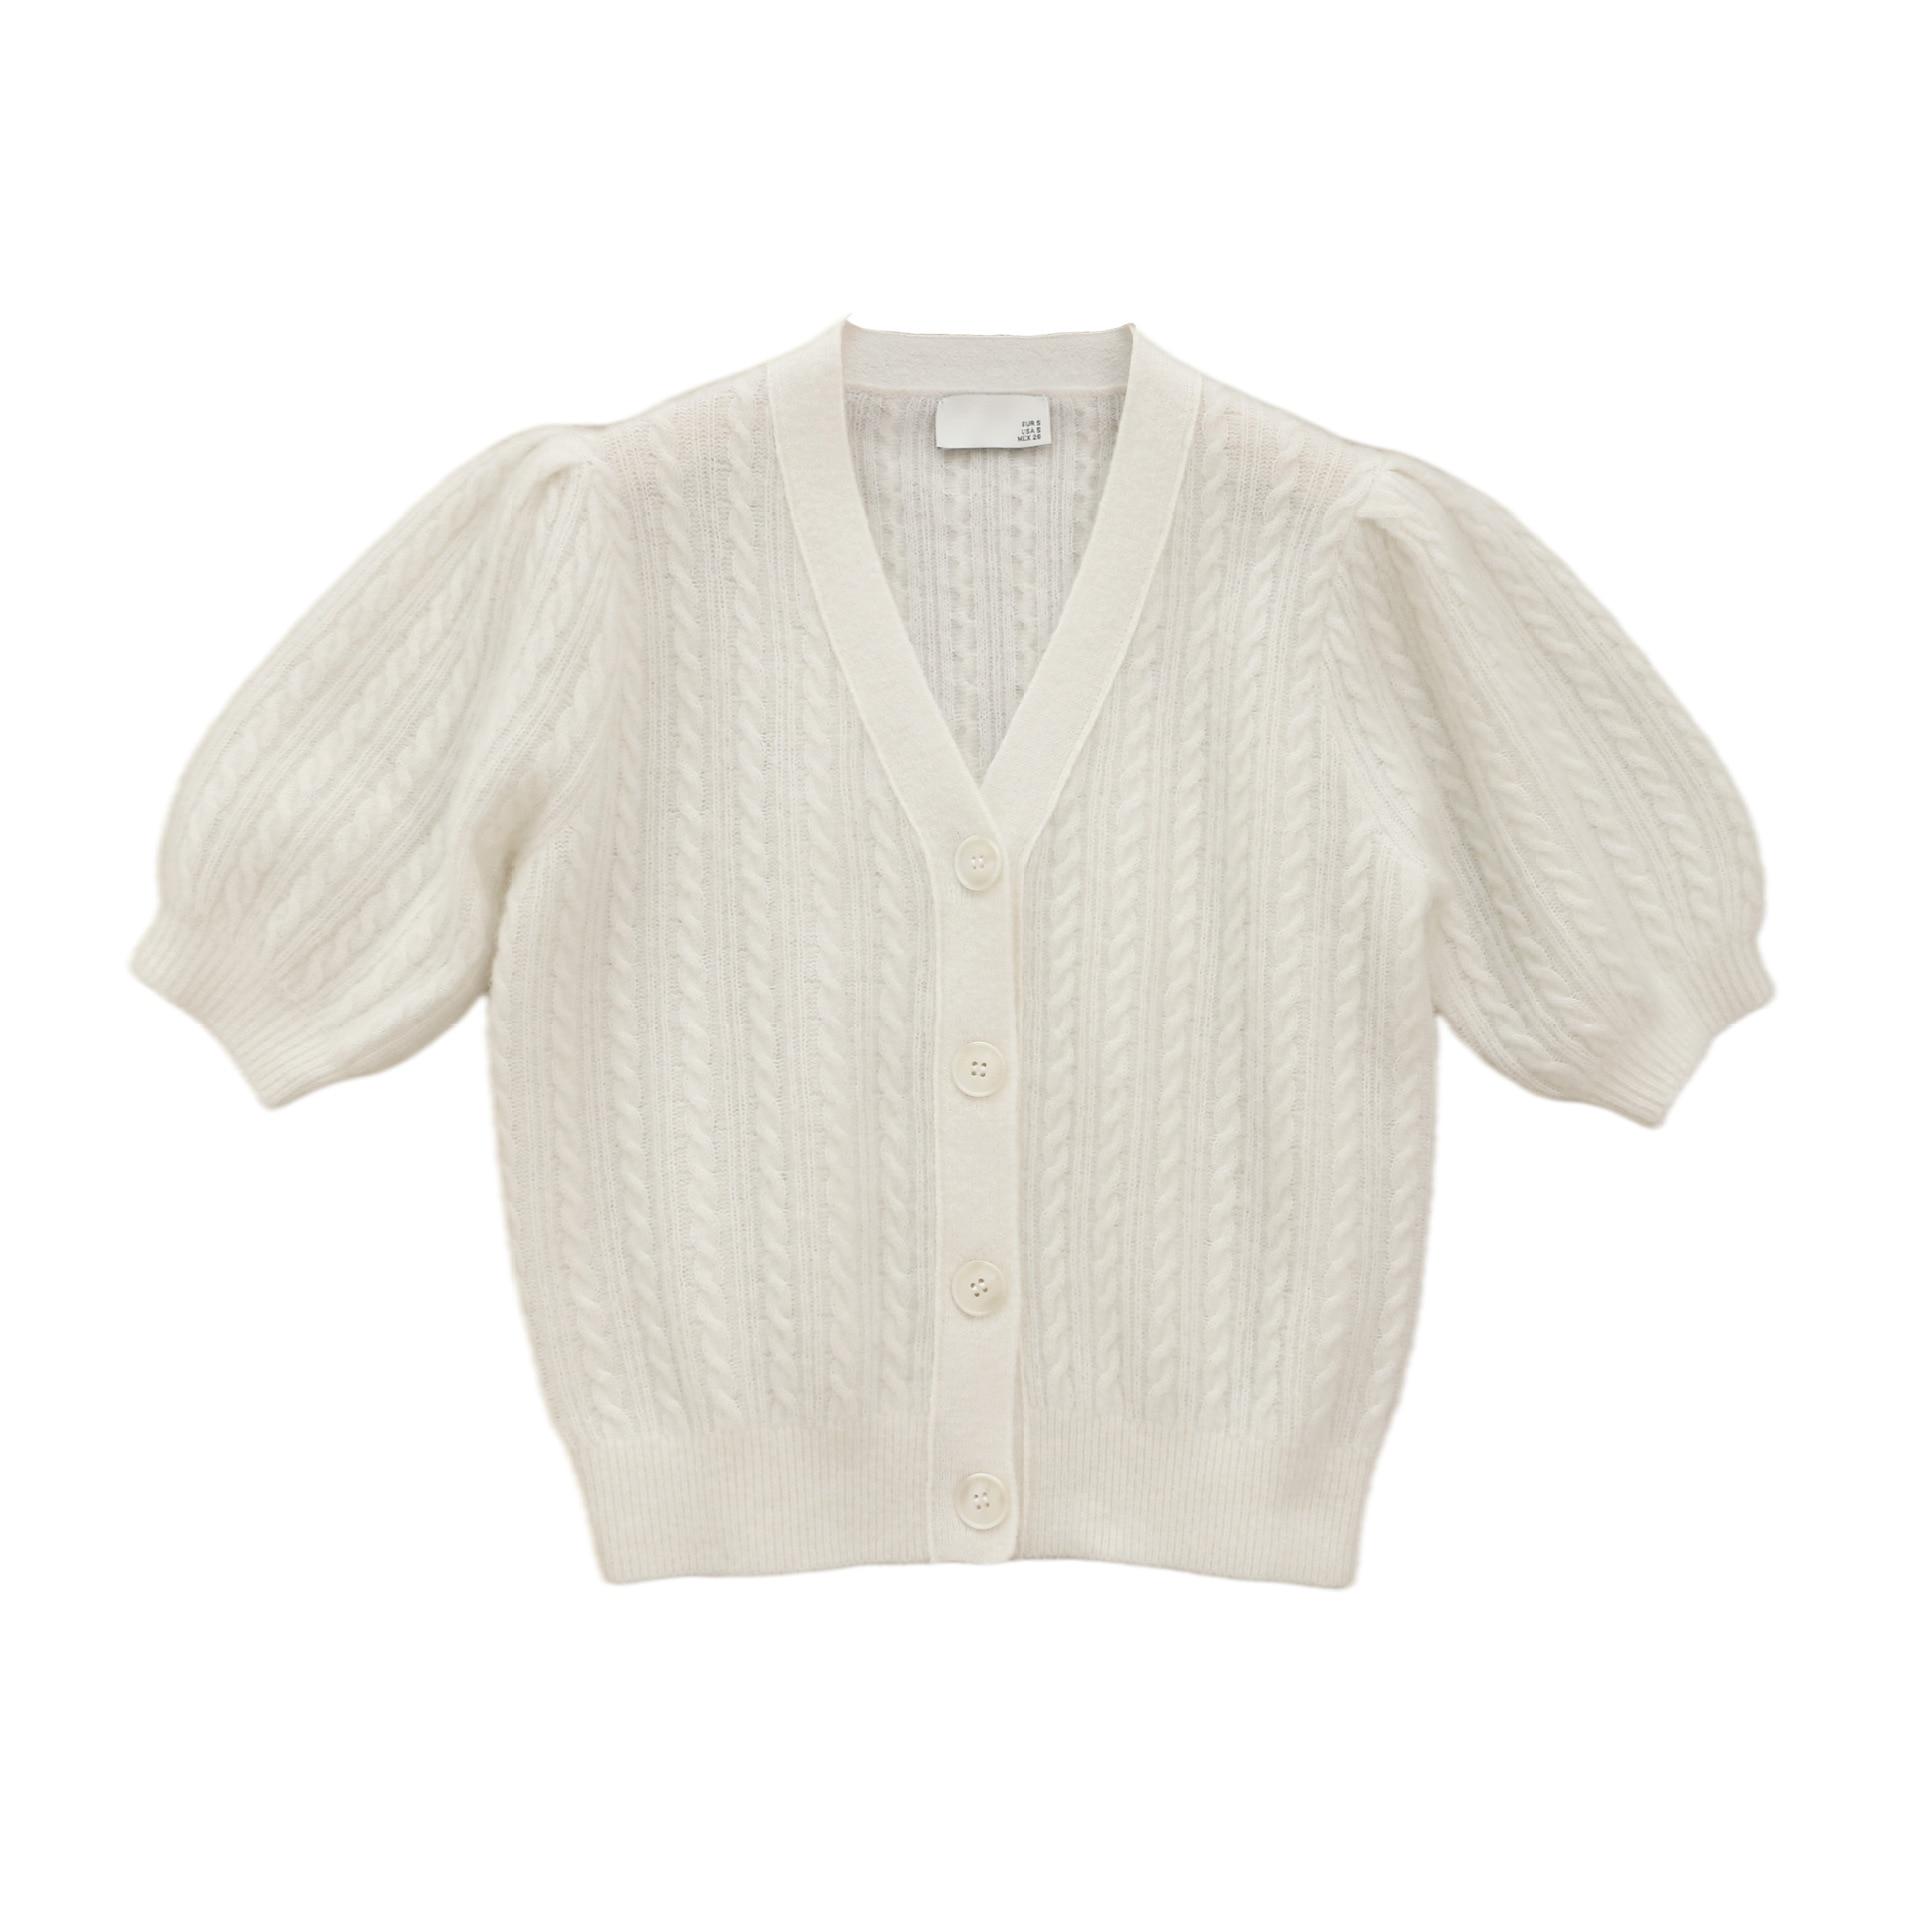 SHUCHAN 35% Mohair Wool Blend SWEATER WOMEN White Puff Sleeve  V-Neck  High Street Crop Tops Cardigan Fashion